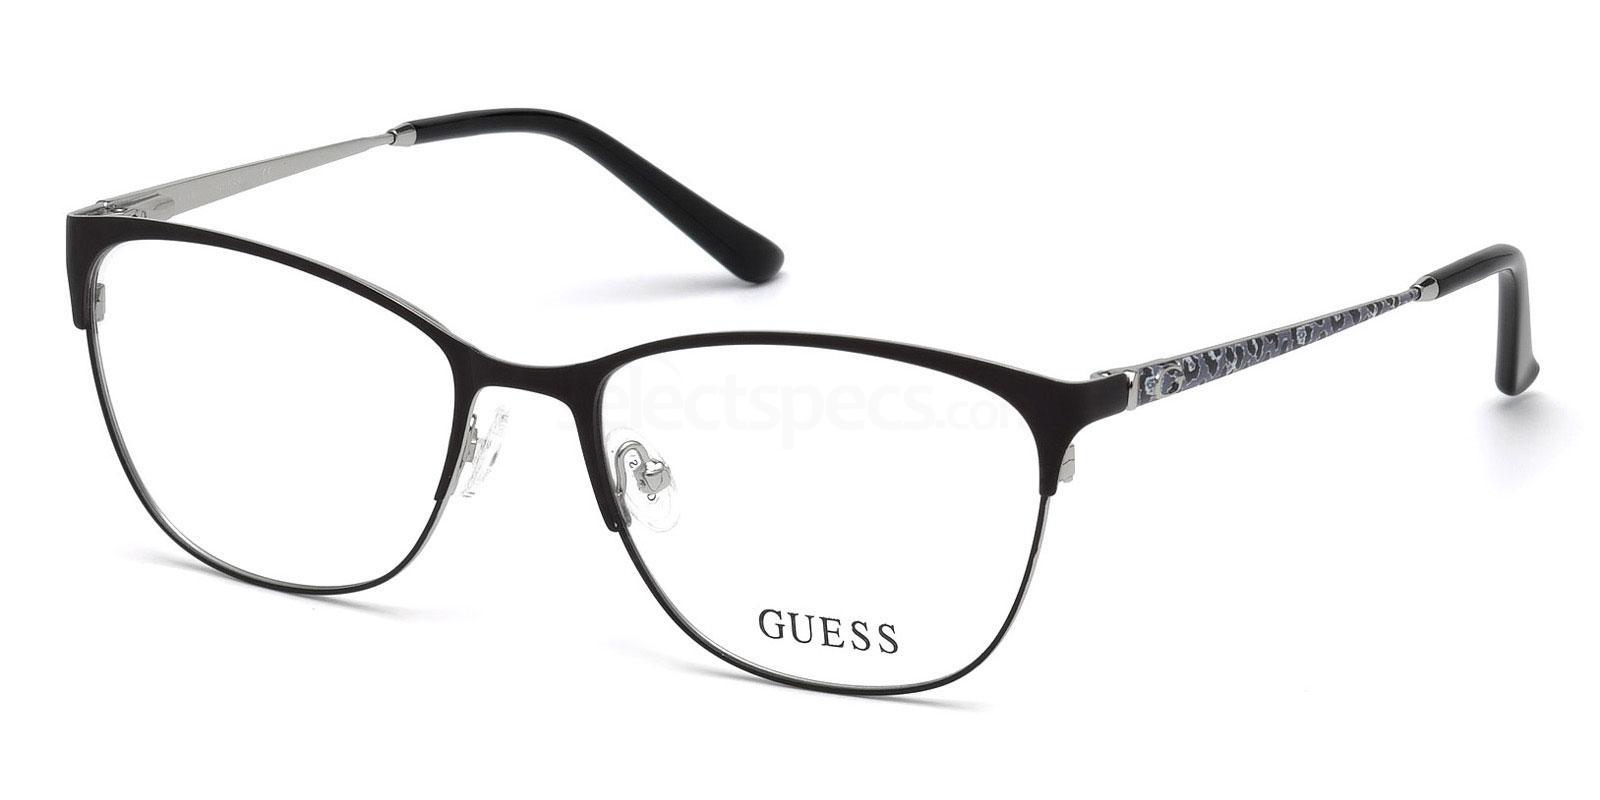 005 GU2583 Glasses, Guess